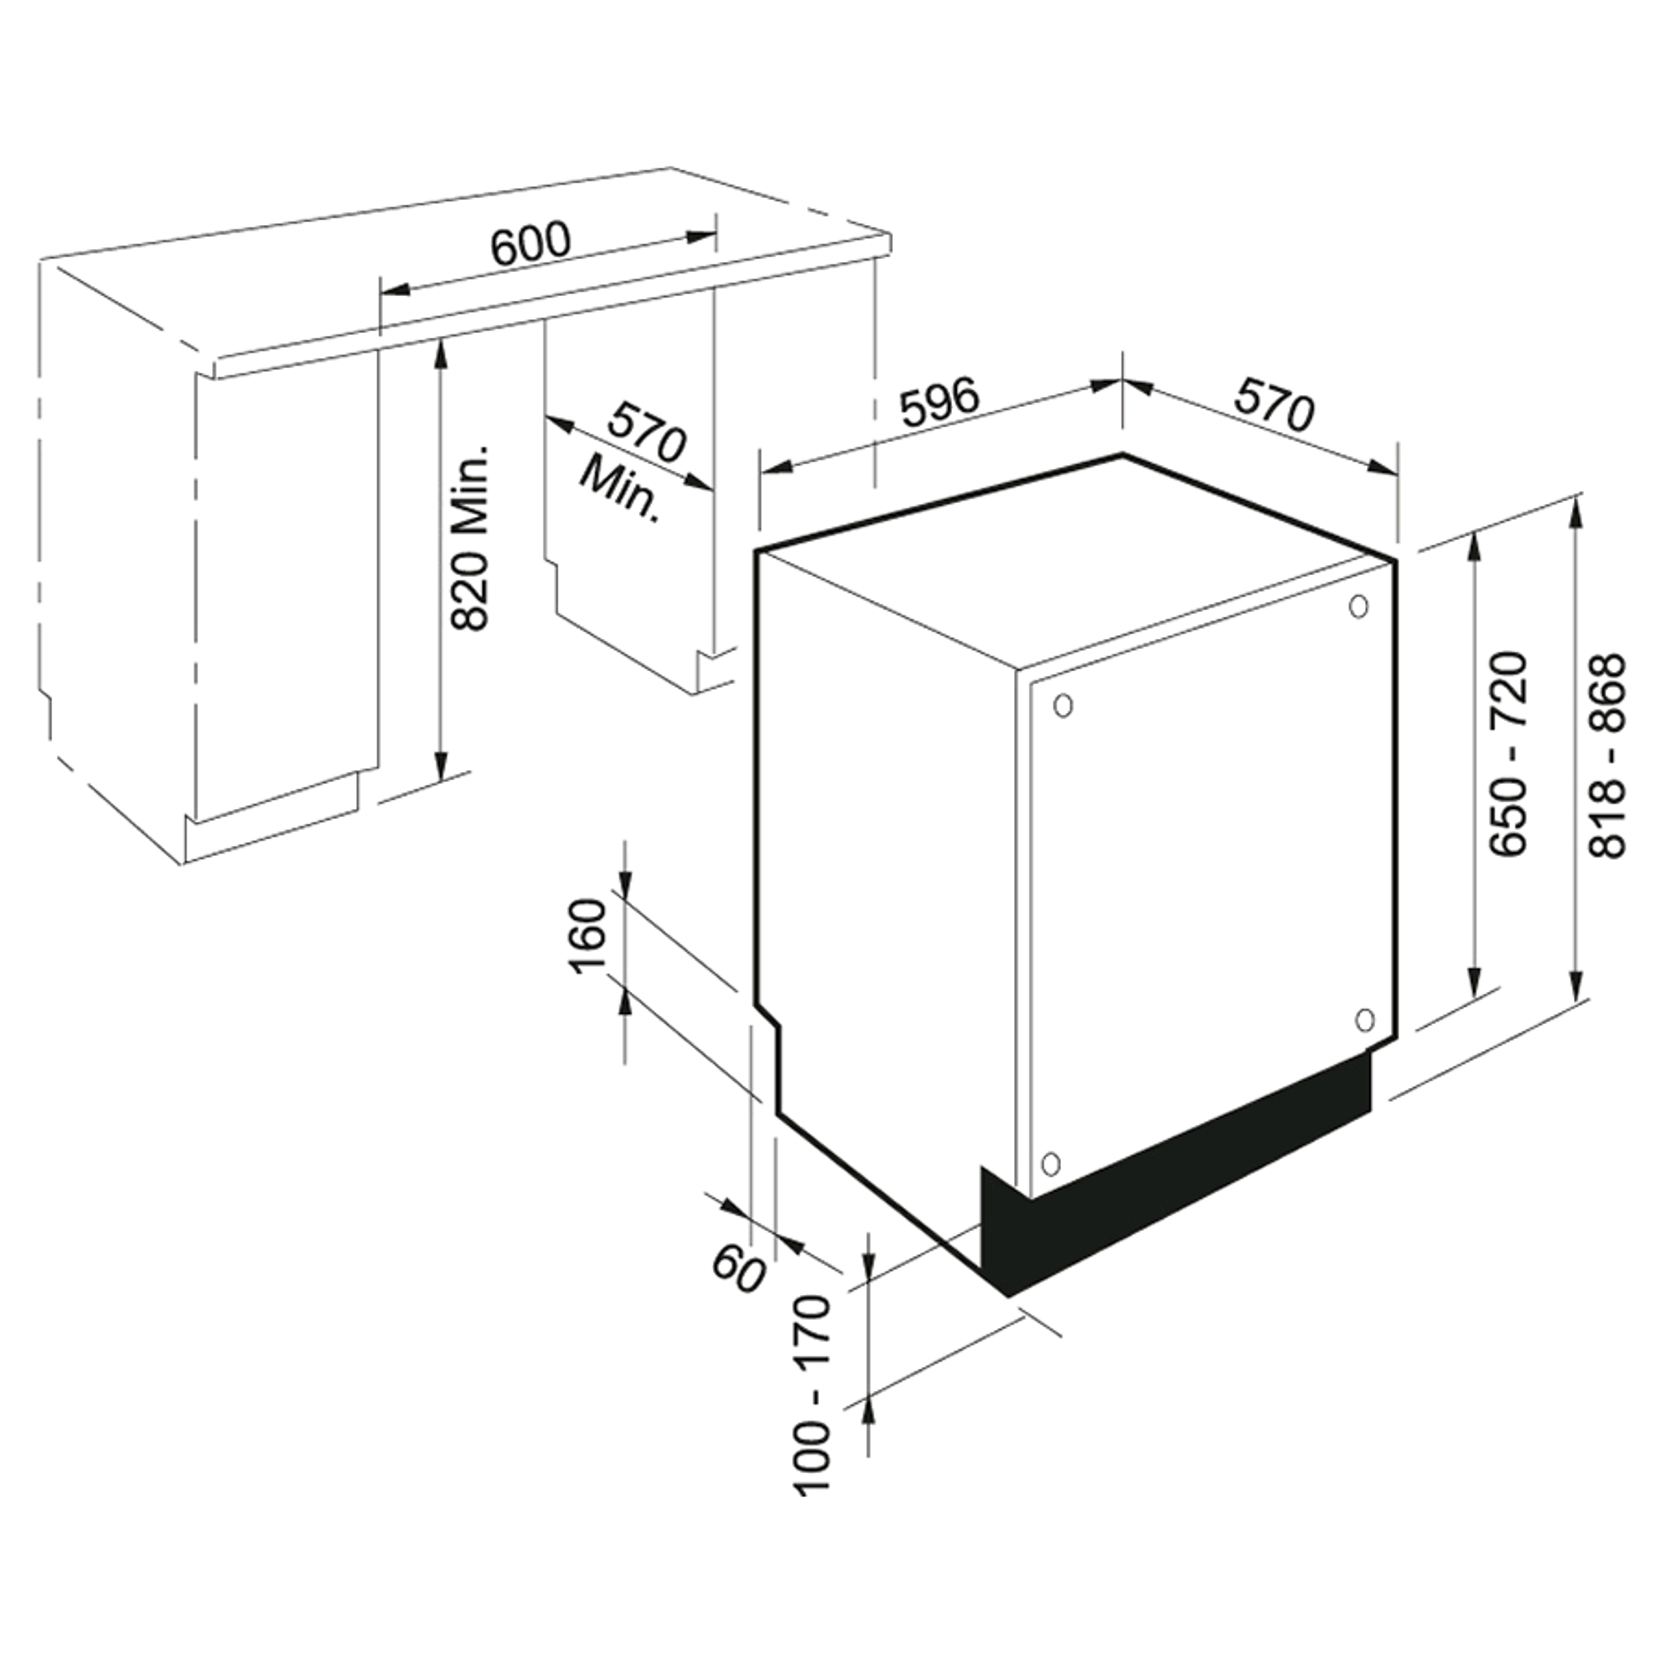 https://www.elettrovillage.it/2093-thickbox_default/lavastoviglie-da-incasso-franke-fdw612ehl-12-coperti-classe-a-garanzia-italia.jpg